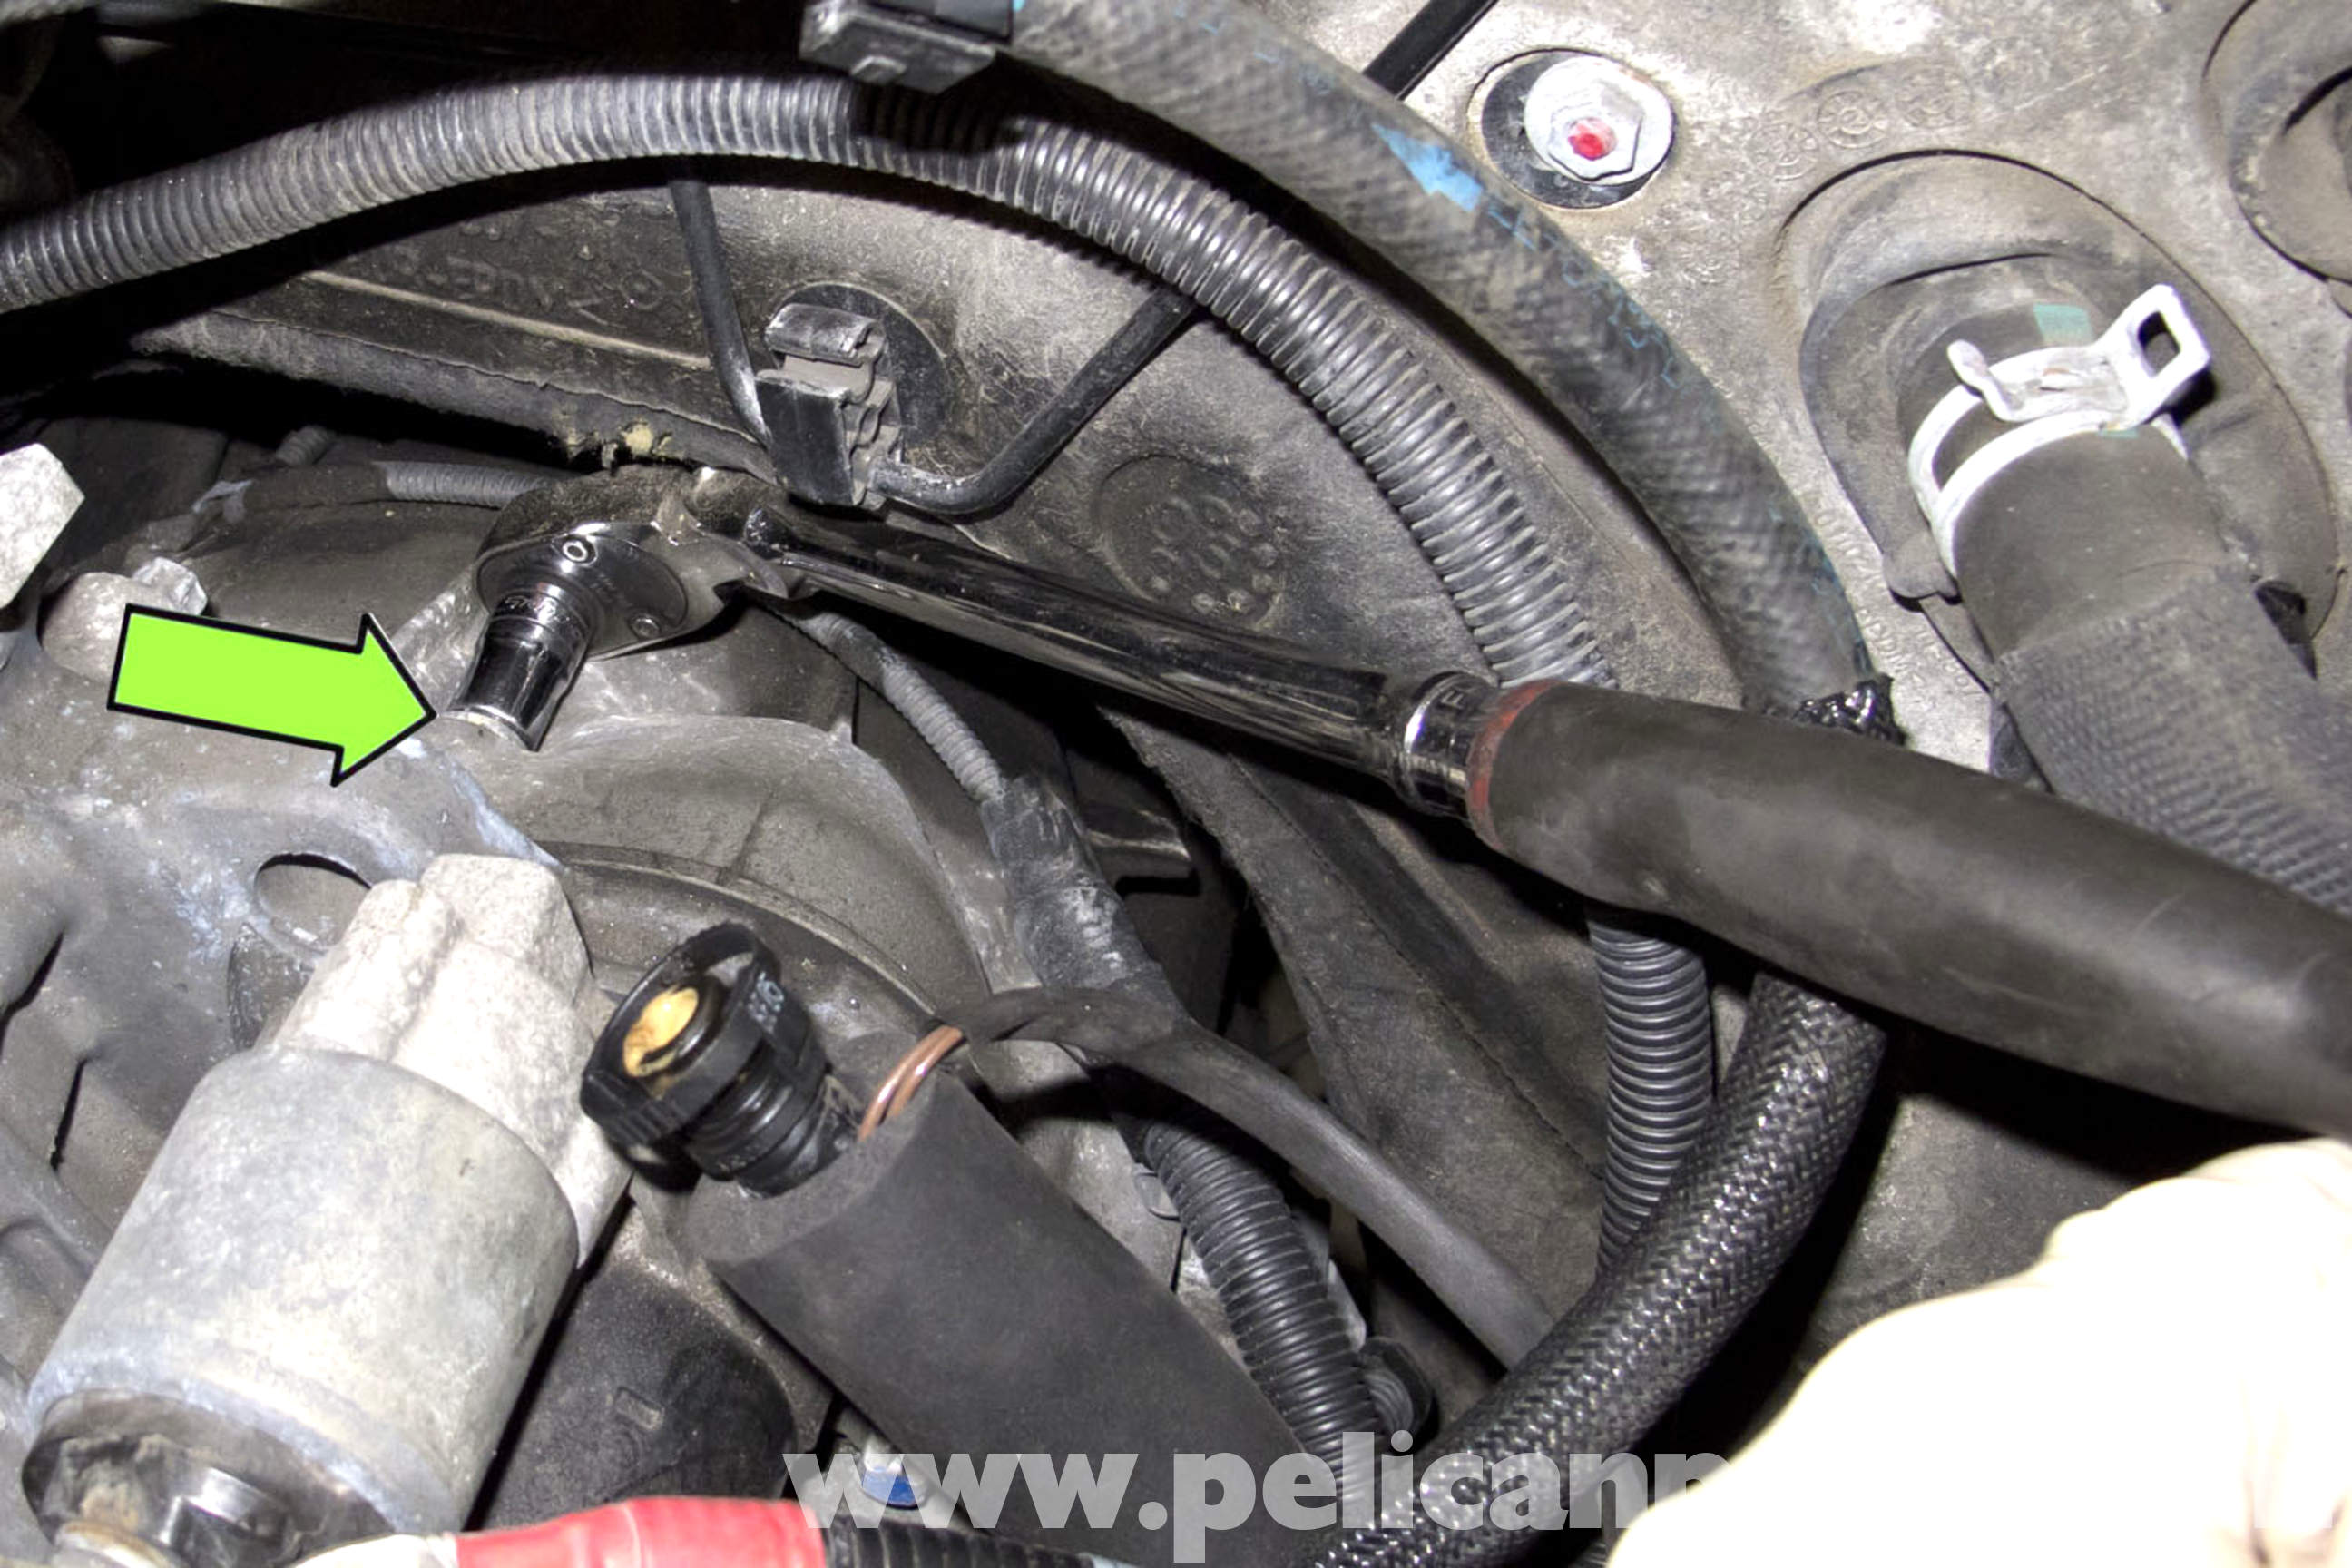 99 Jeep Cherokee Electrical Schematics Bmw E90 Starter Replacement E91 E92 E93 Pelican